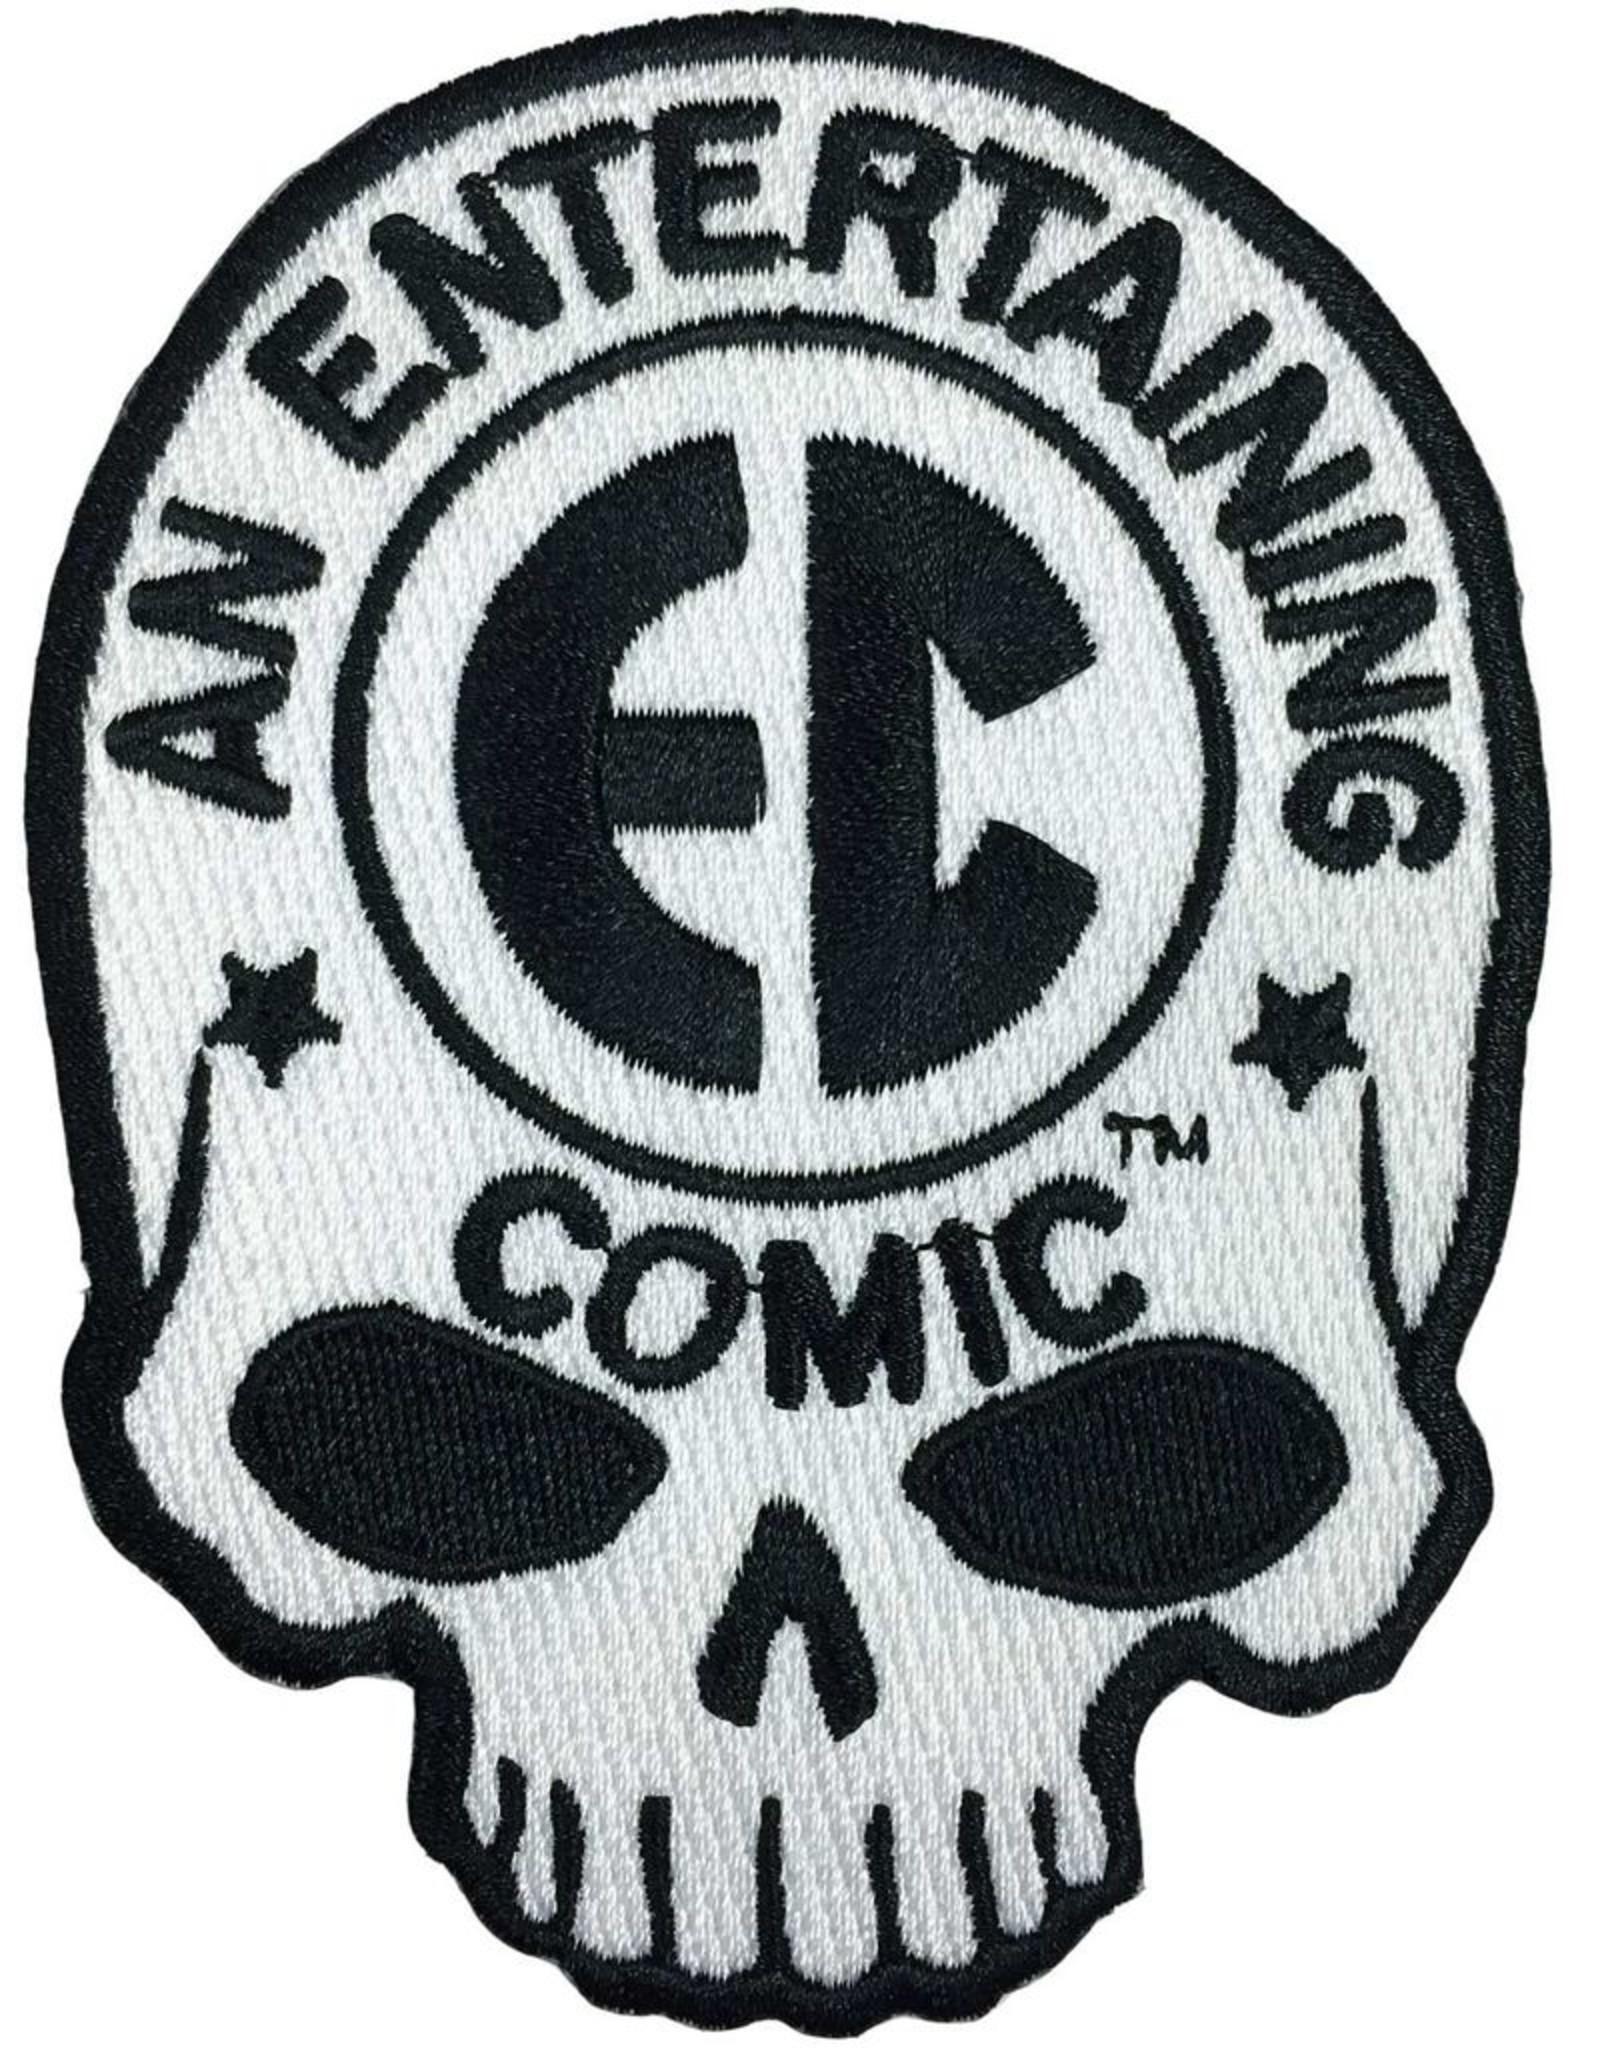 EC Comic Skull Logo Patch